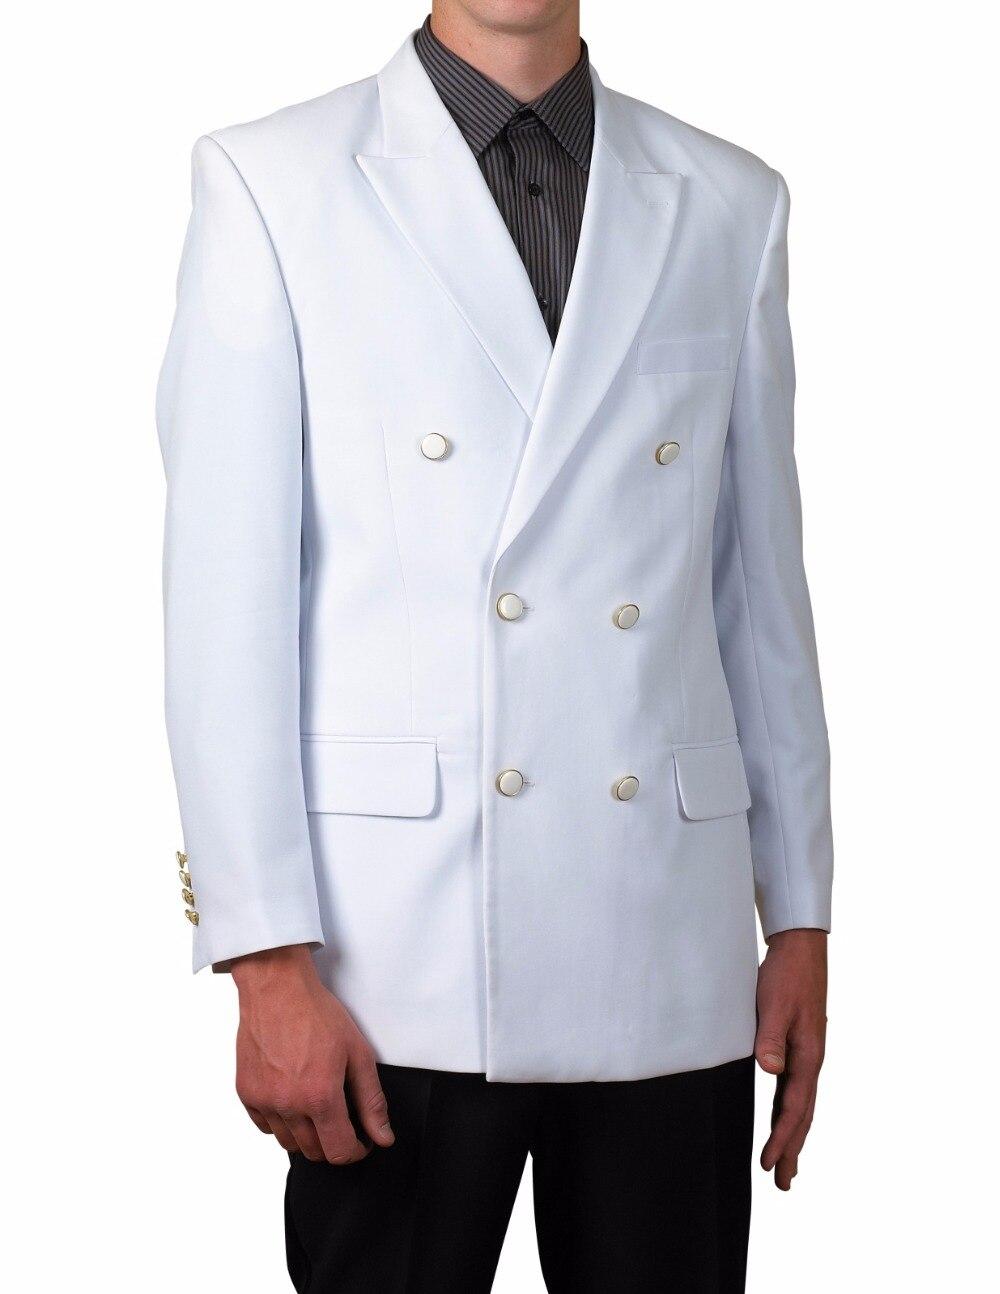 2017 New White Men Suit Slim Fit Double Breasted 2 Piece Tuxedo Custom Prom Wedding Suits Blazer Terno Masuclino Jacket+Pant